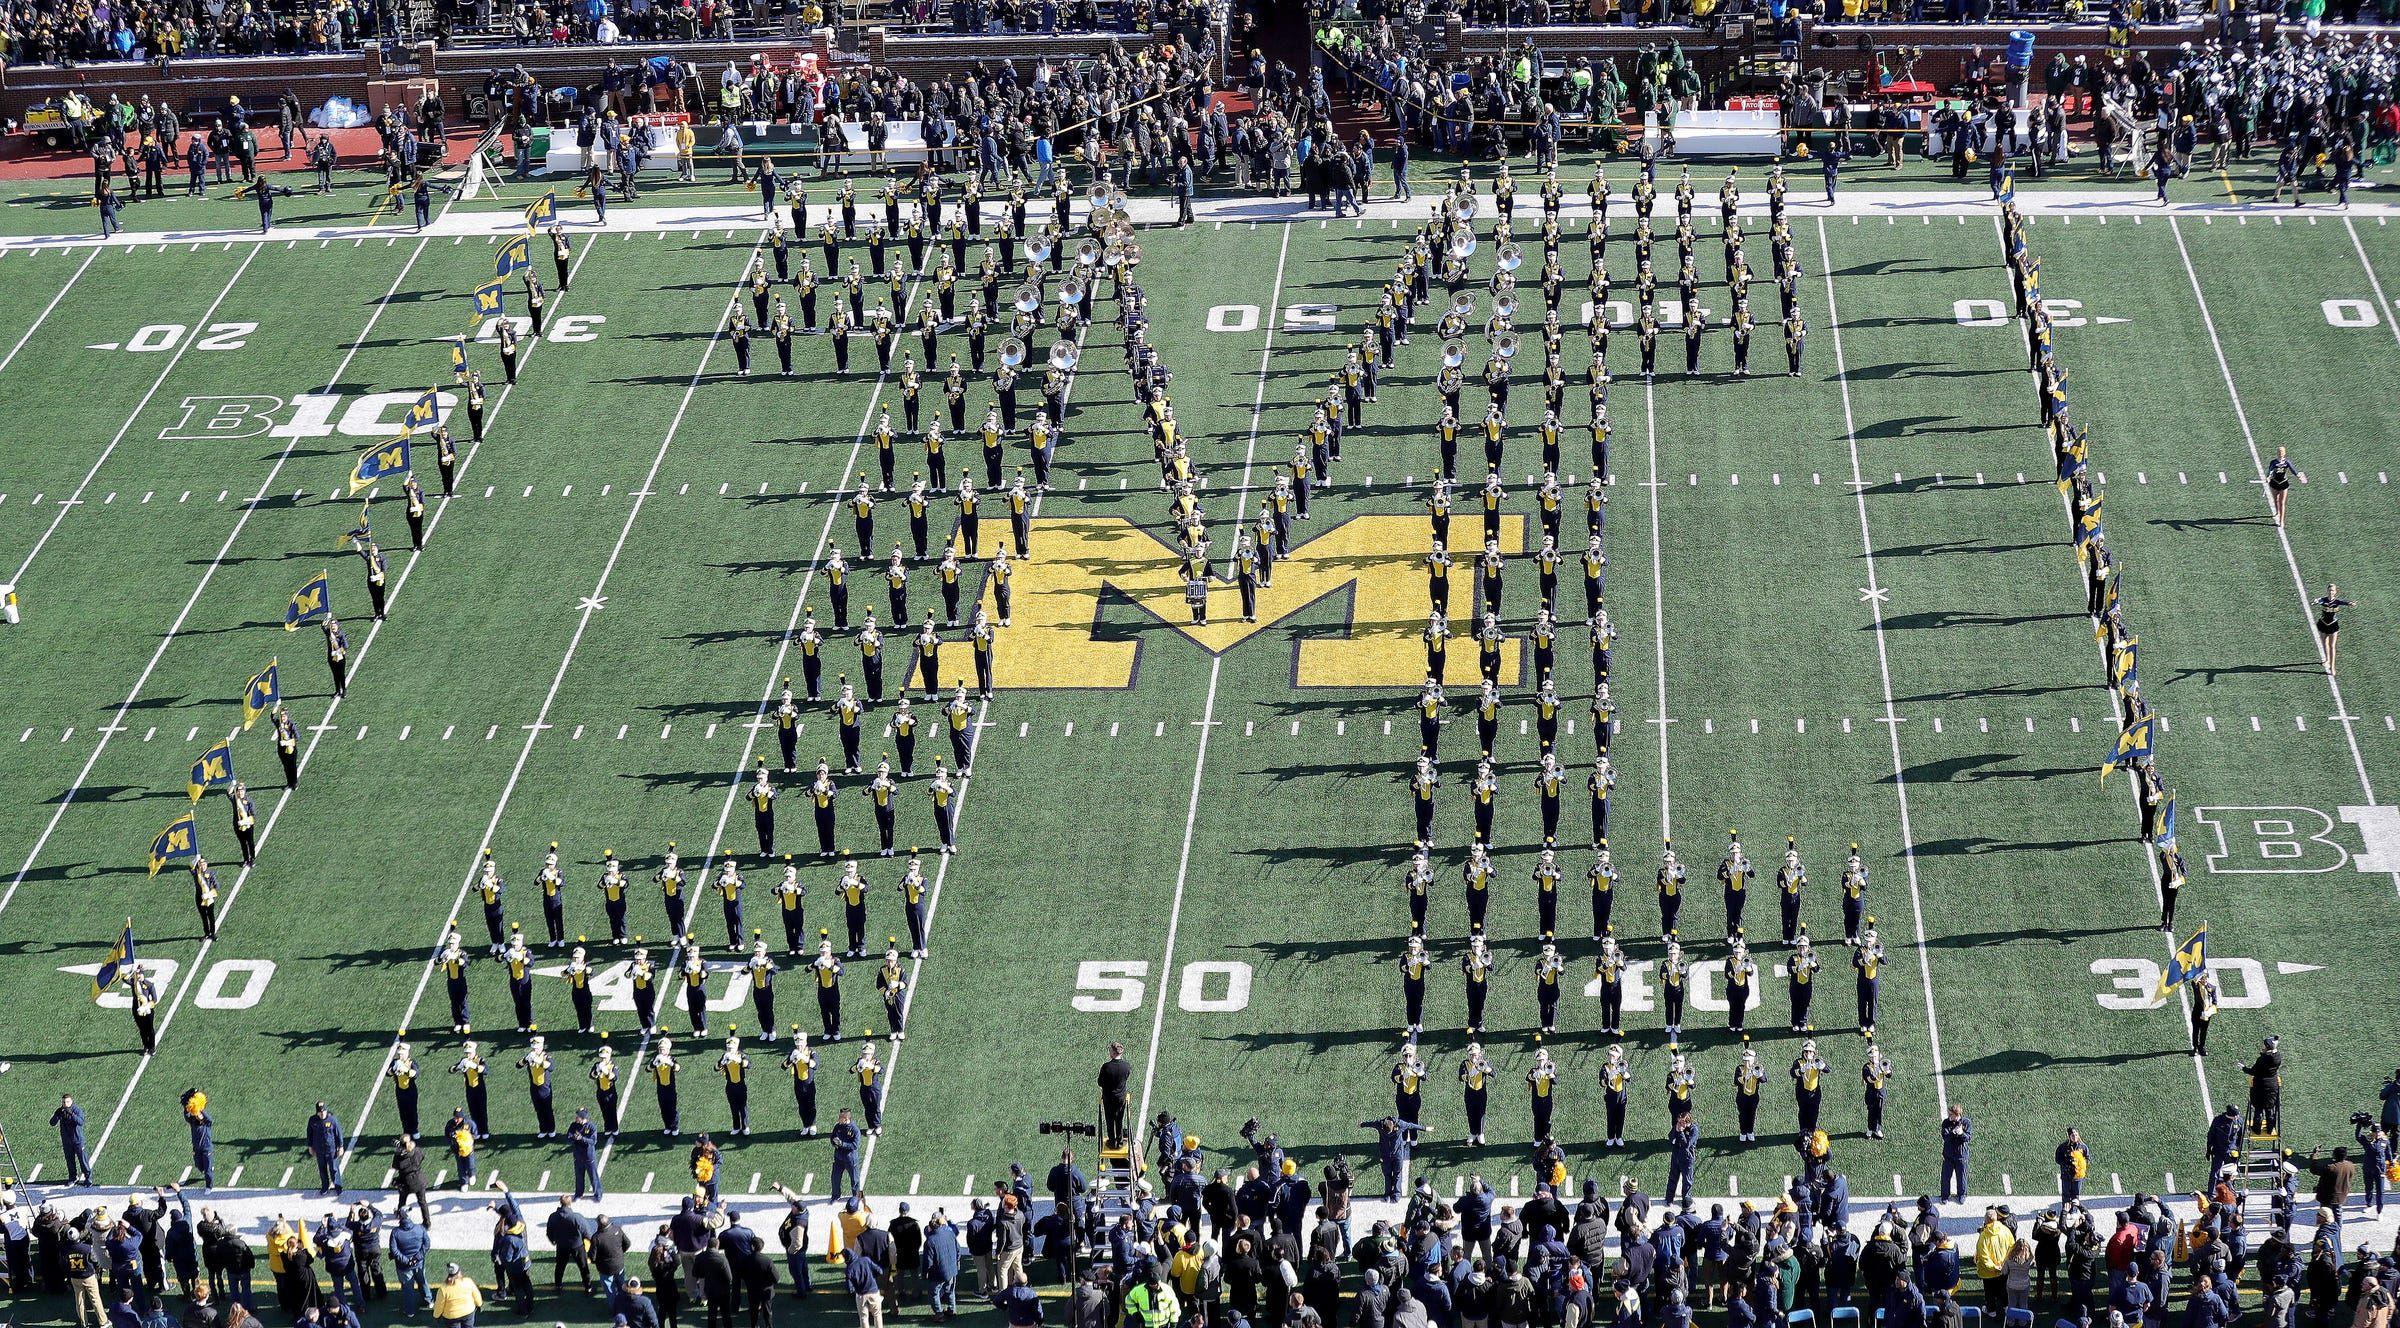 Michigan footballs recruiting hot streak continues with